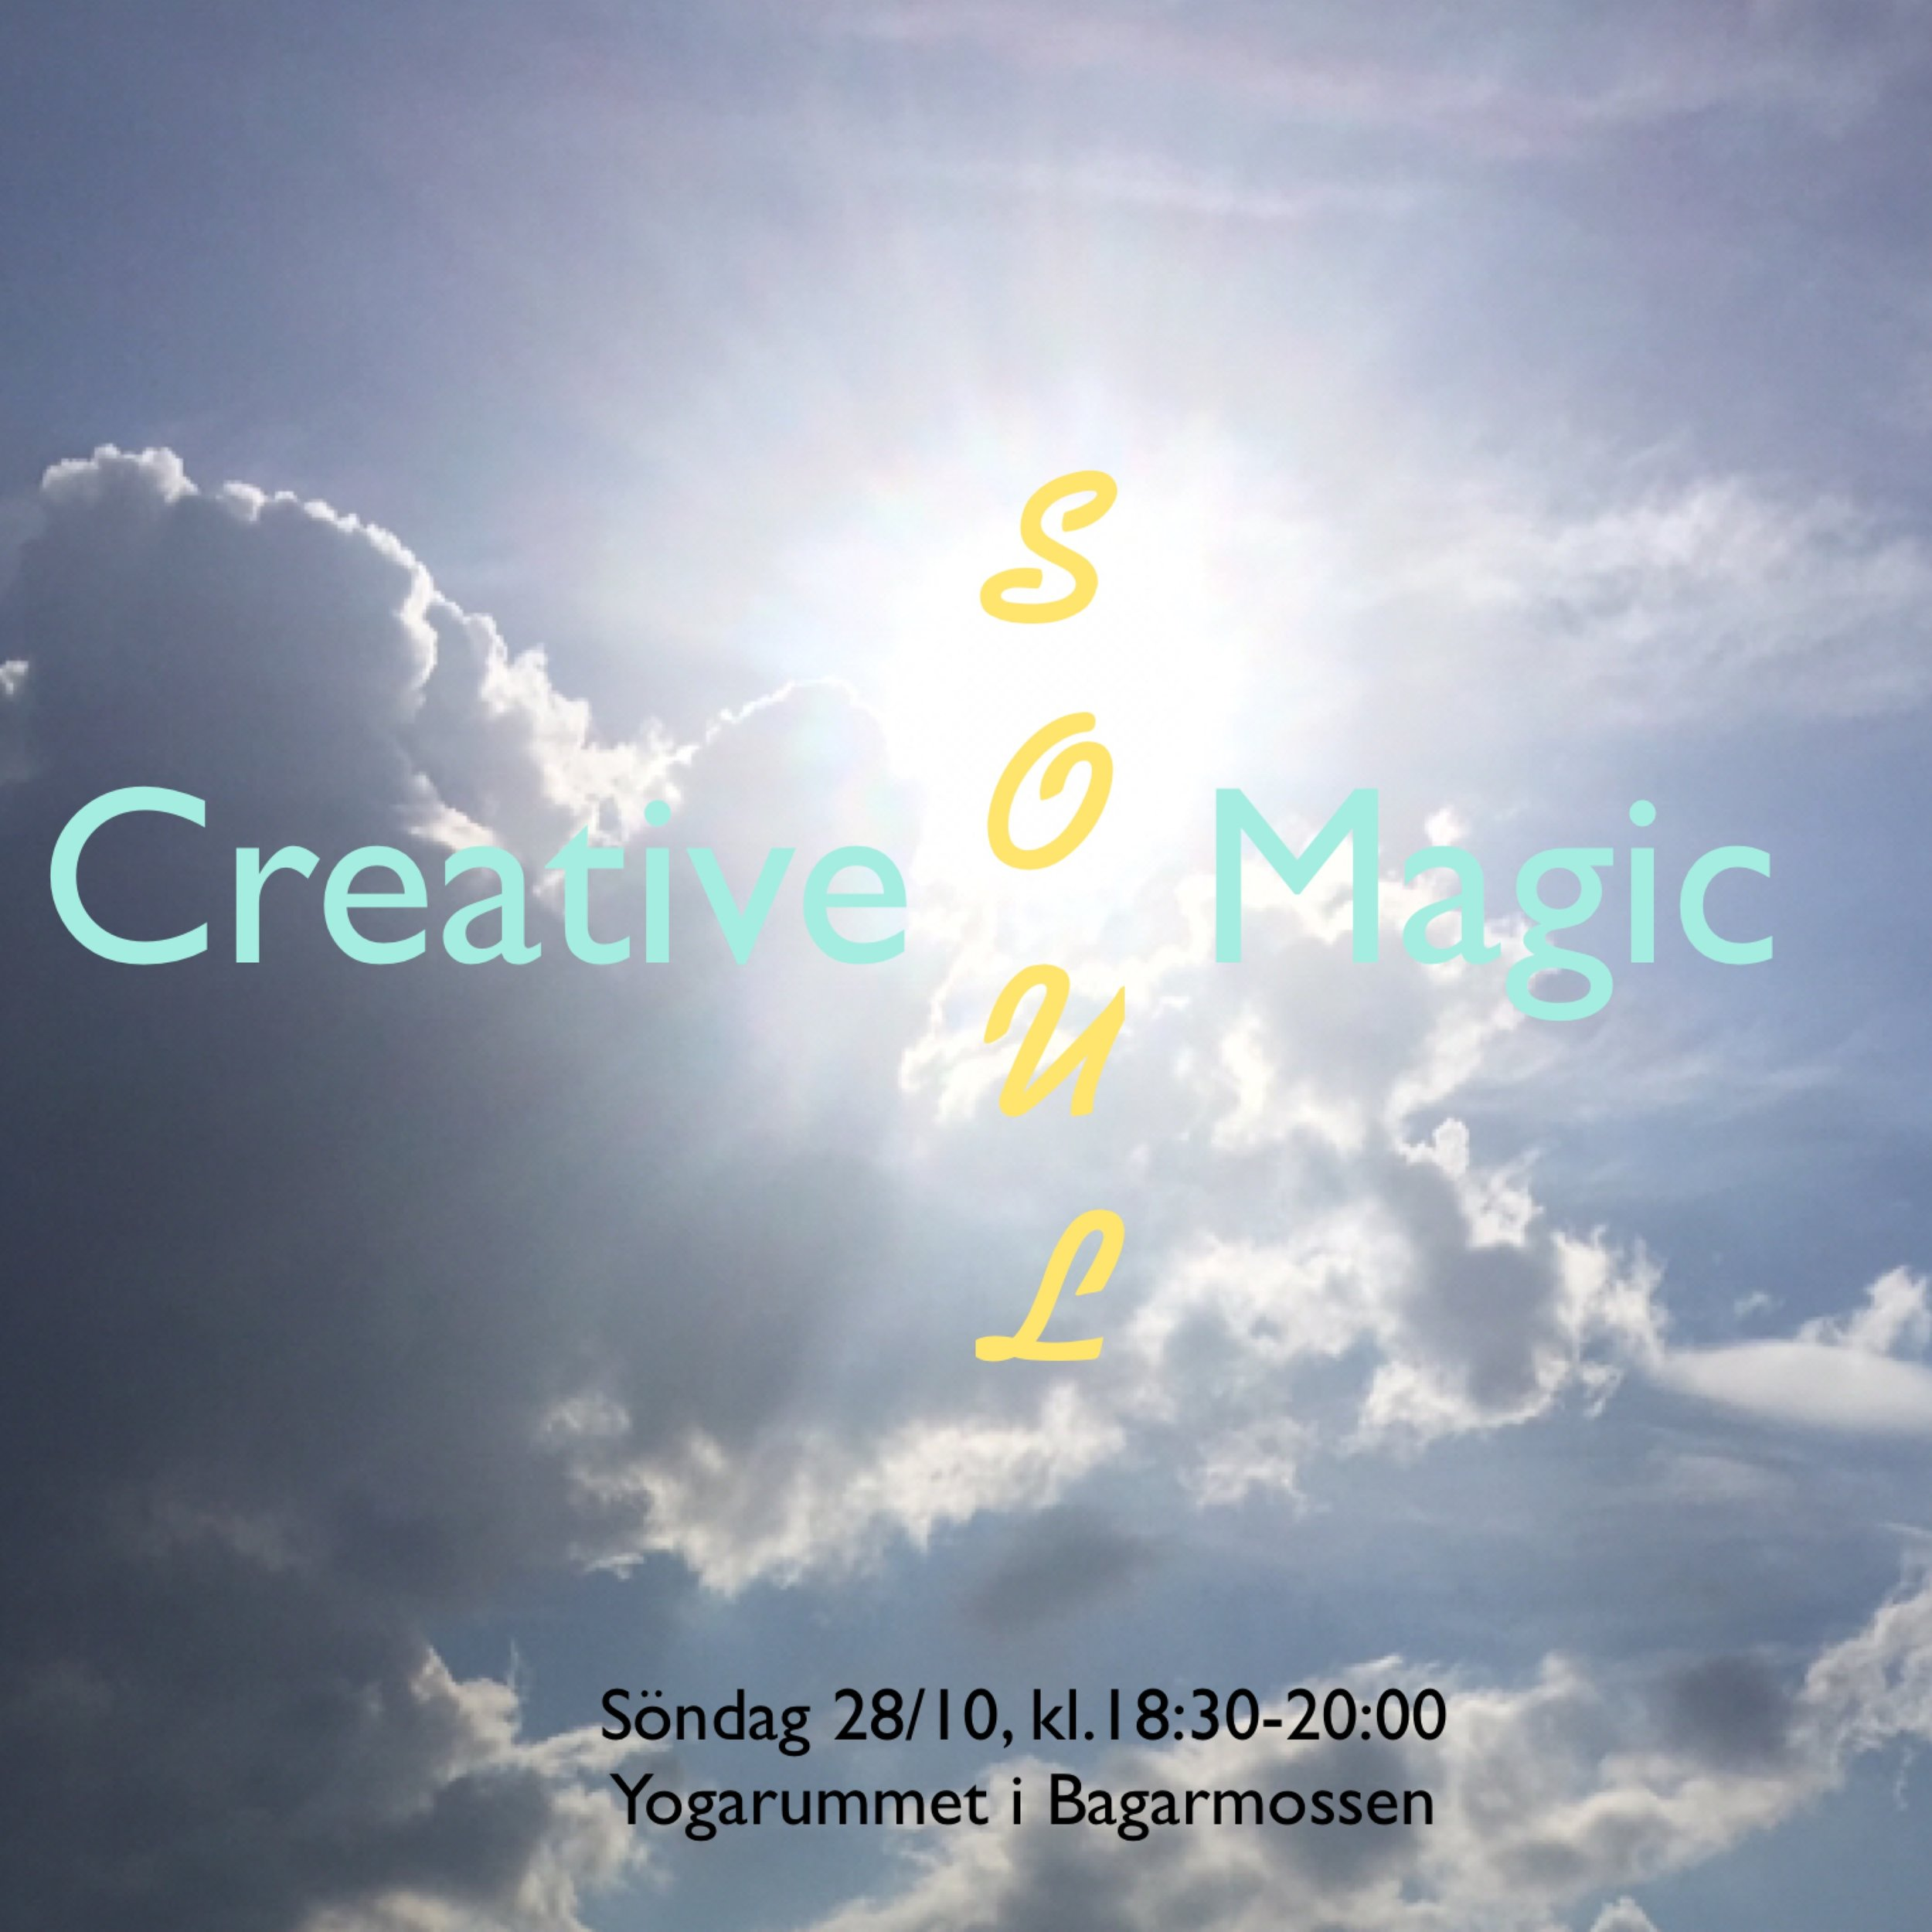 CREATIVE_SOULMAGIC_Yogarummet.JPG